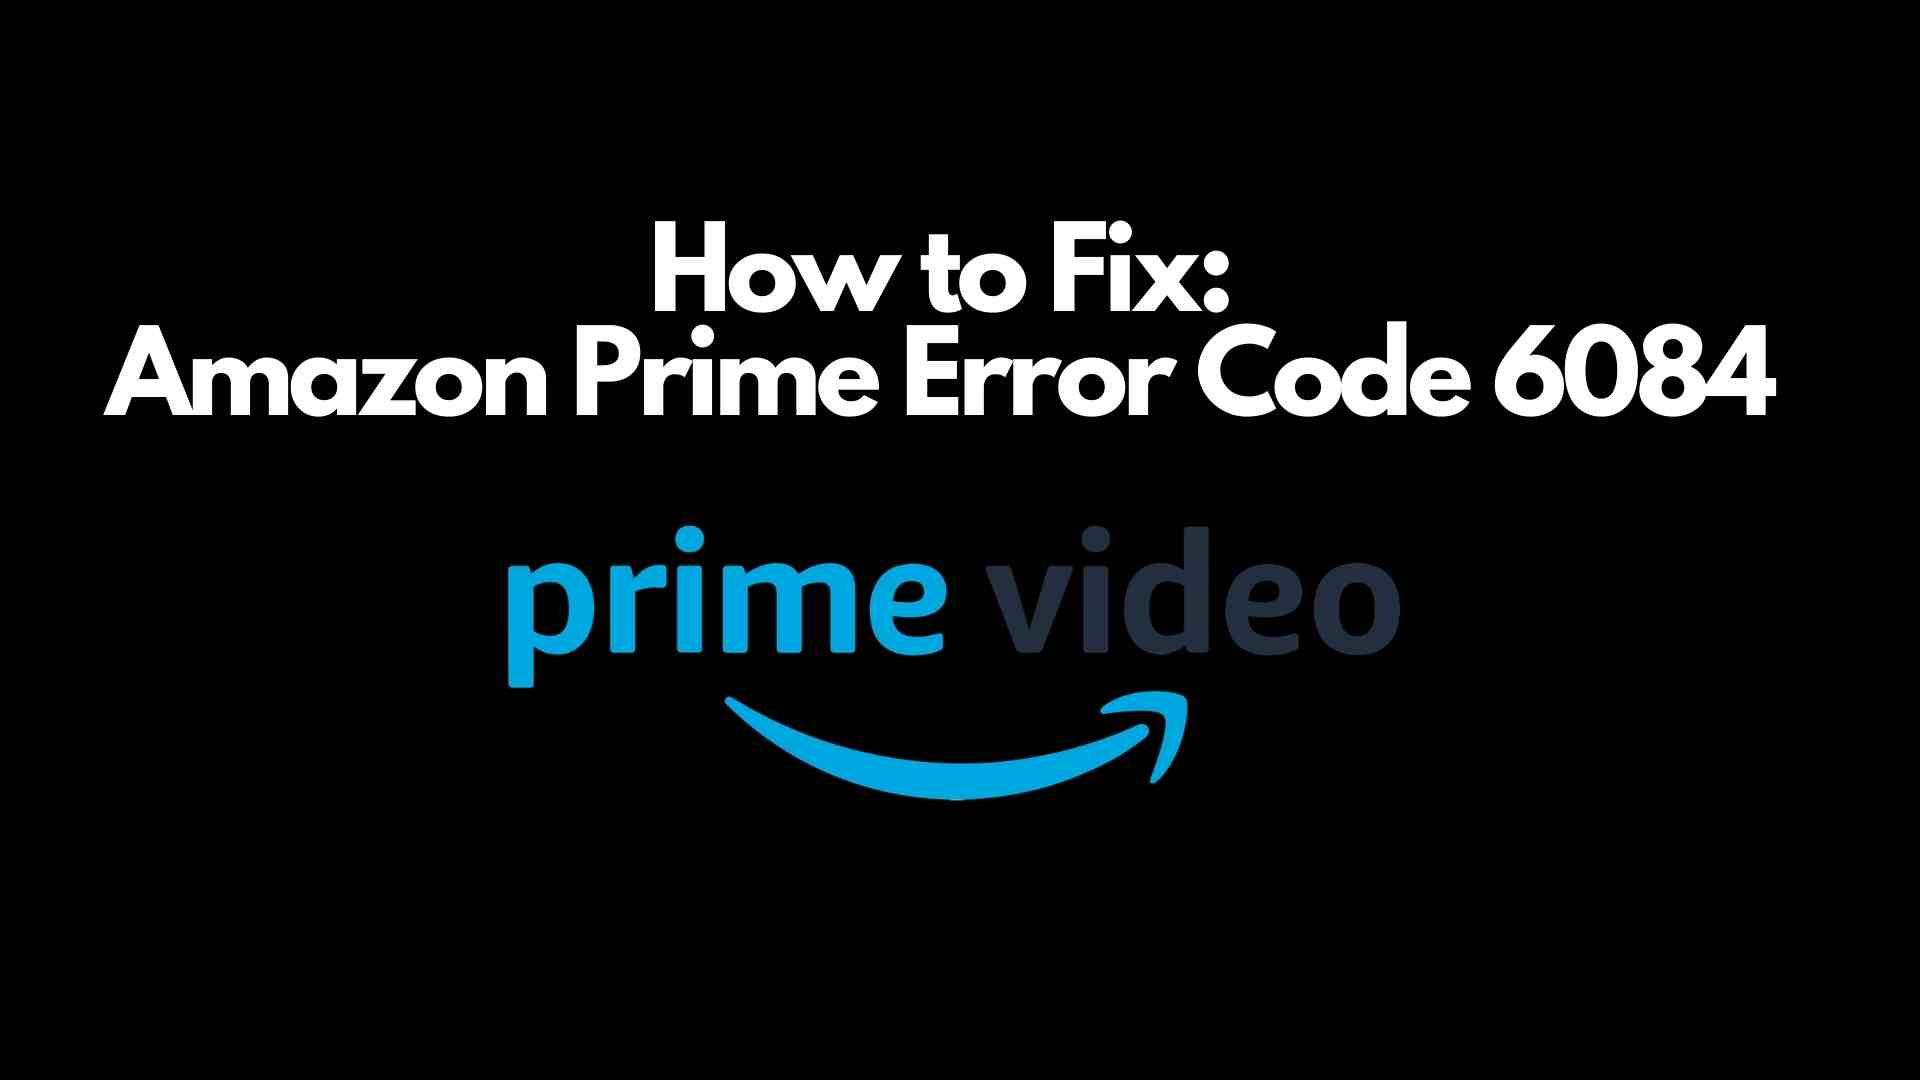 Amazon Prime Error Code 6084 fix